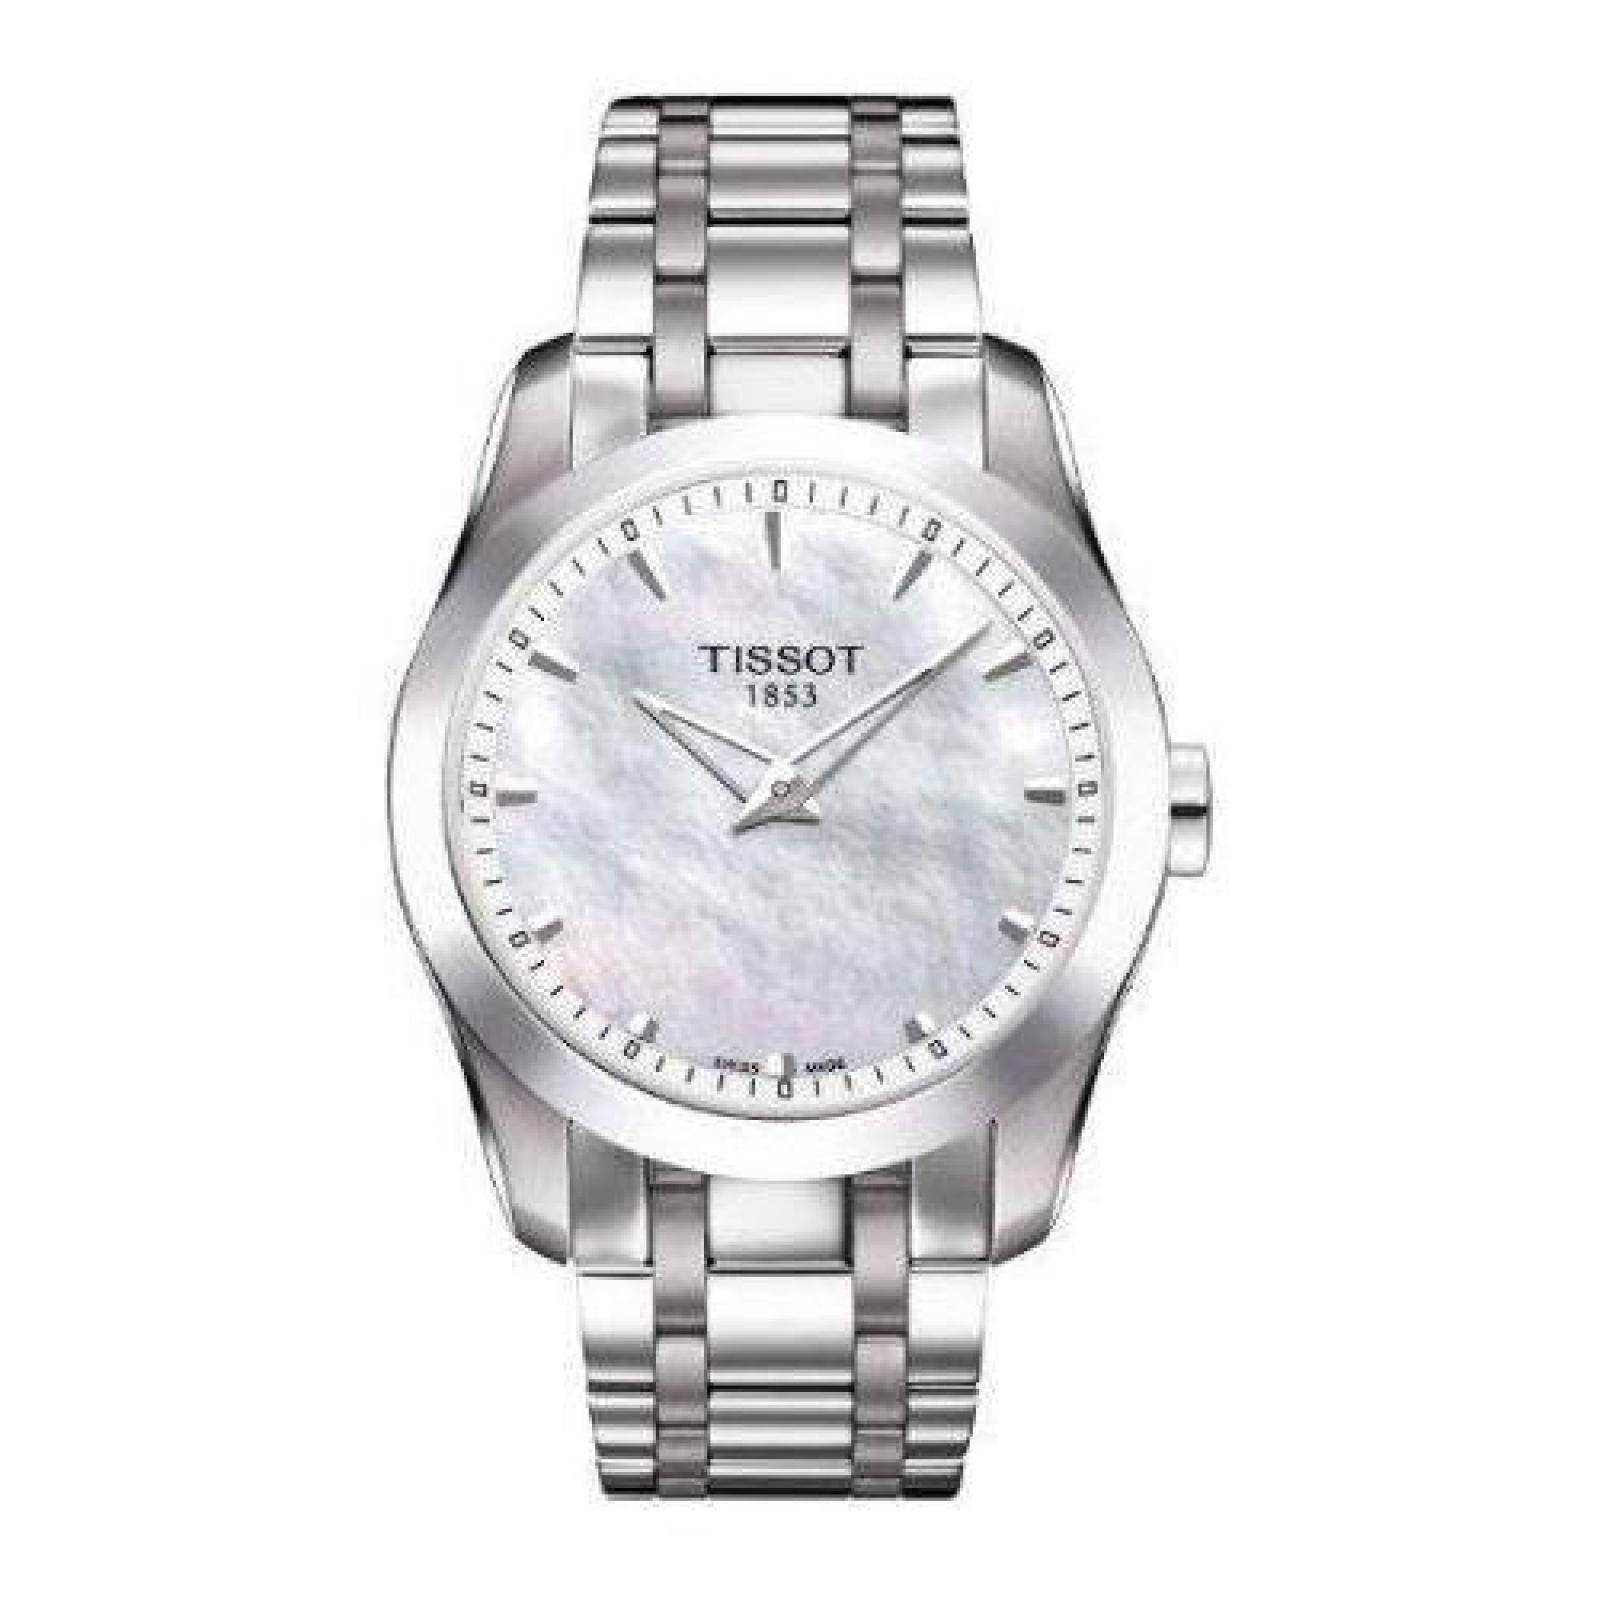 Damen-Armbanduhr XS Analog Quarz Edelstahl T035.246.11.111.00